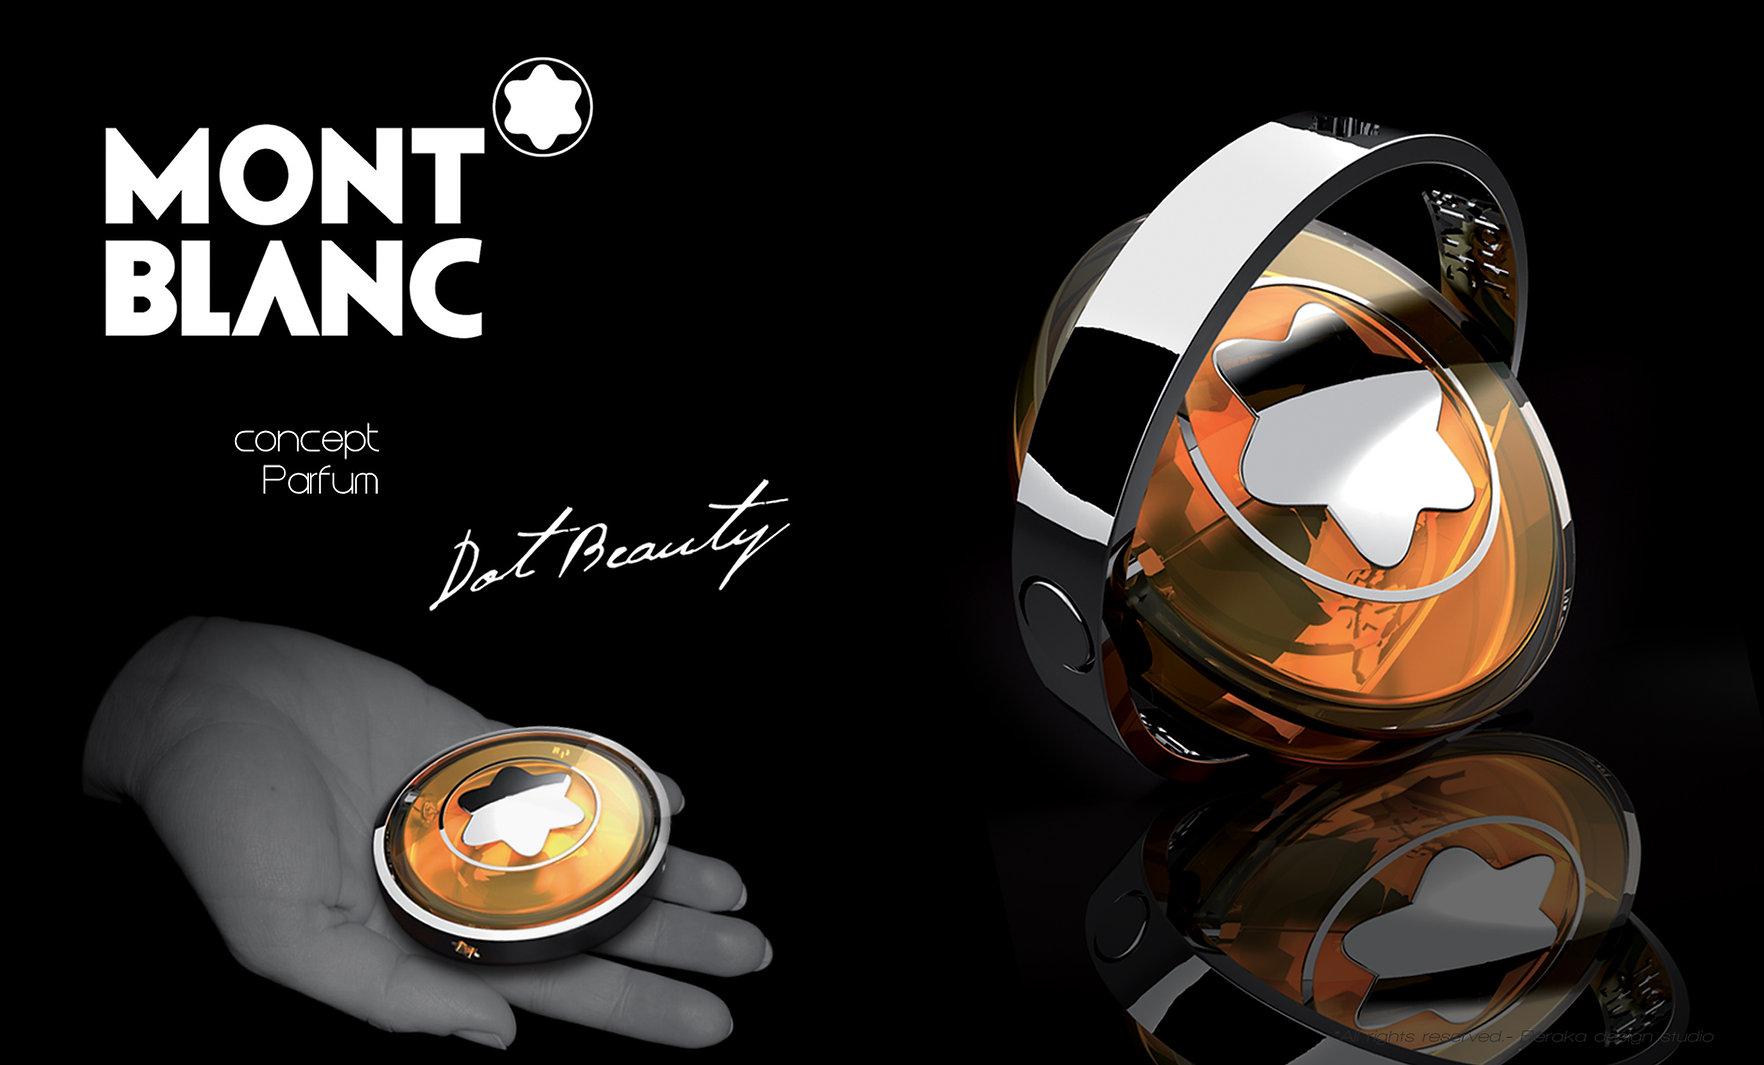 designer industriel parfum cosmétique design